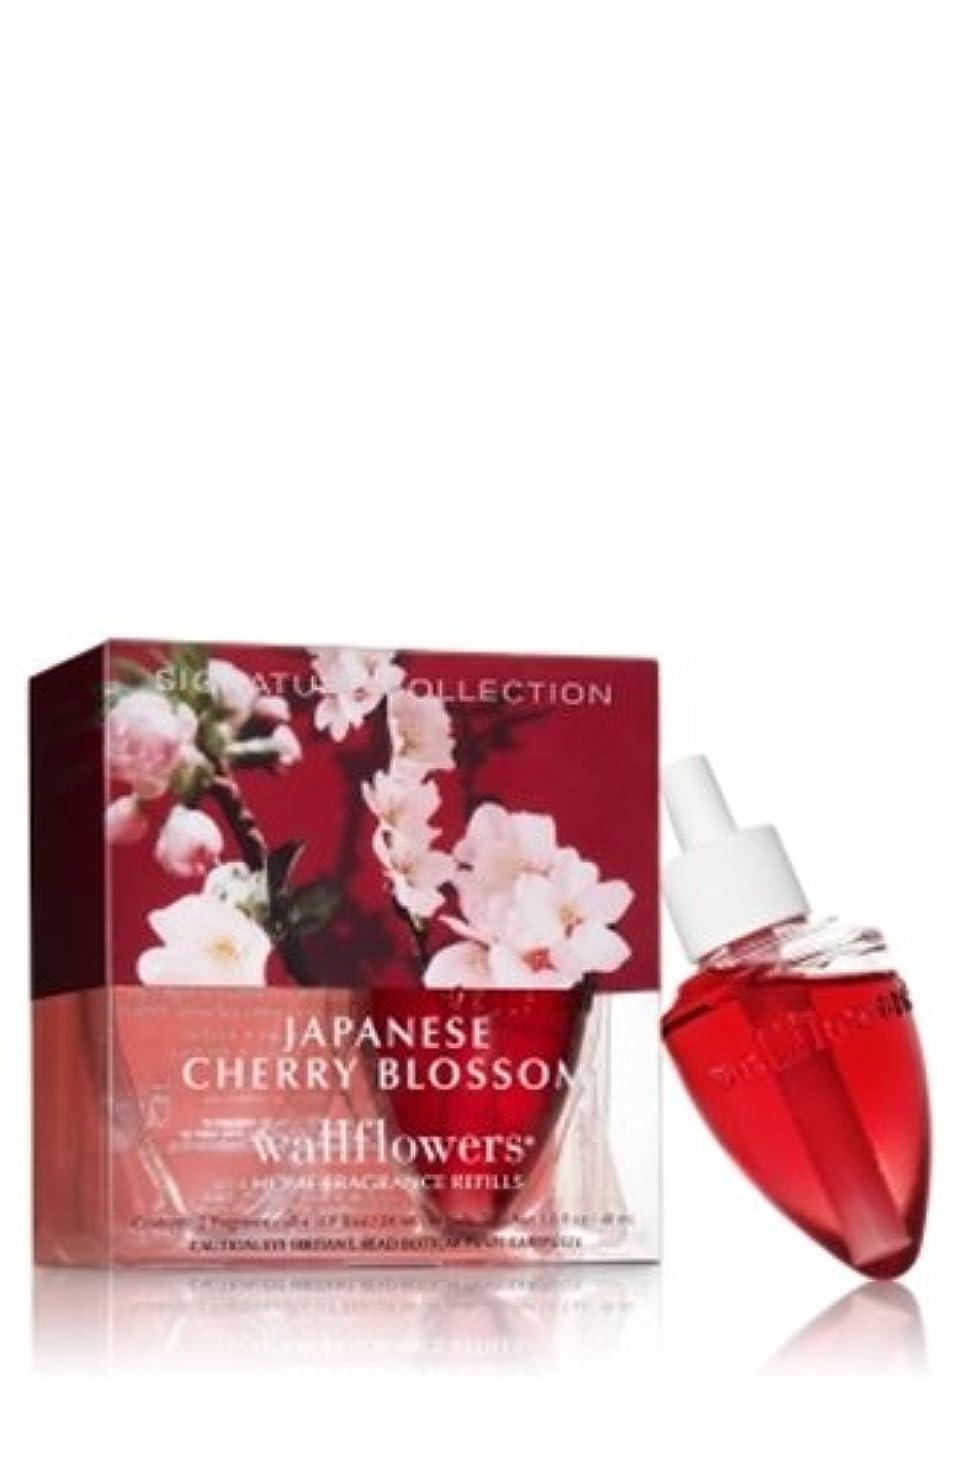 Bath & Body Works(バス&ボディワークス)ジャパニーズチェリーブロッサム ホームフレグランス レフィル2本セット(本体は別売りです)Japanese Cherry Blossom Wallflowers...